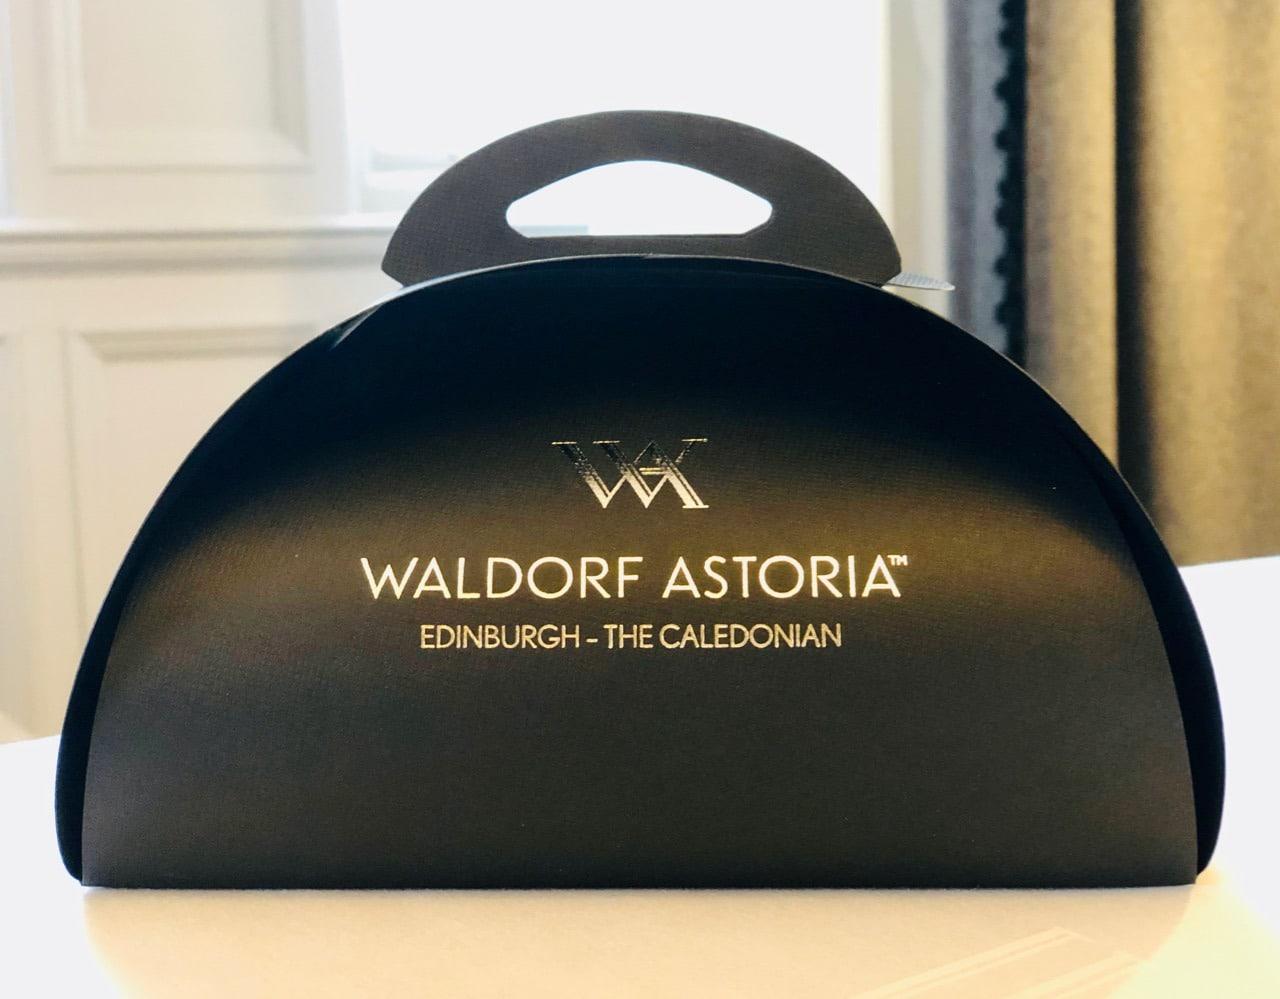 Doggy Bag Afternoon Tea Peacock Alley Waldorf Astoria Edinburgh